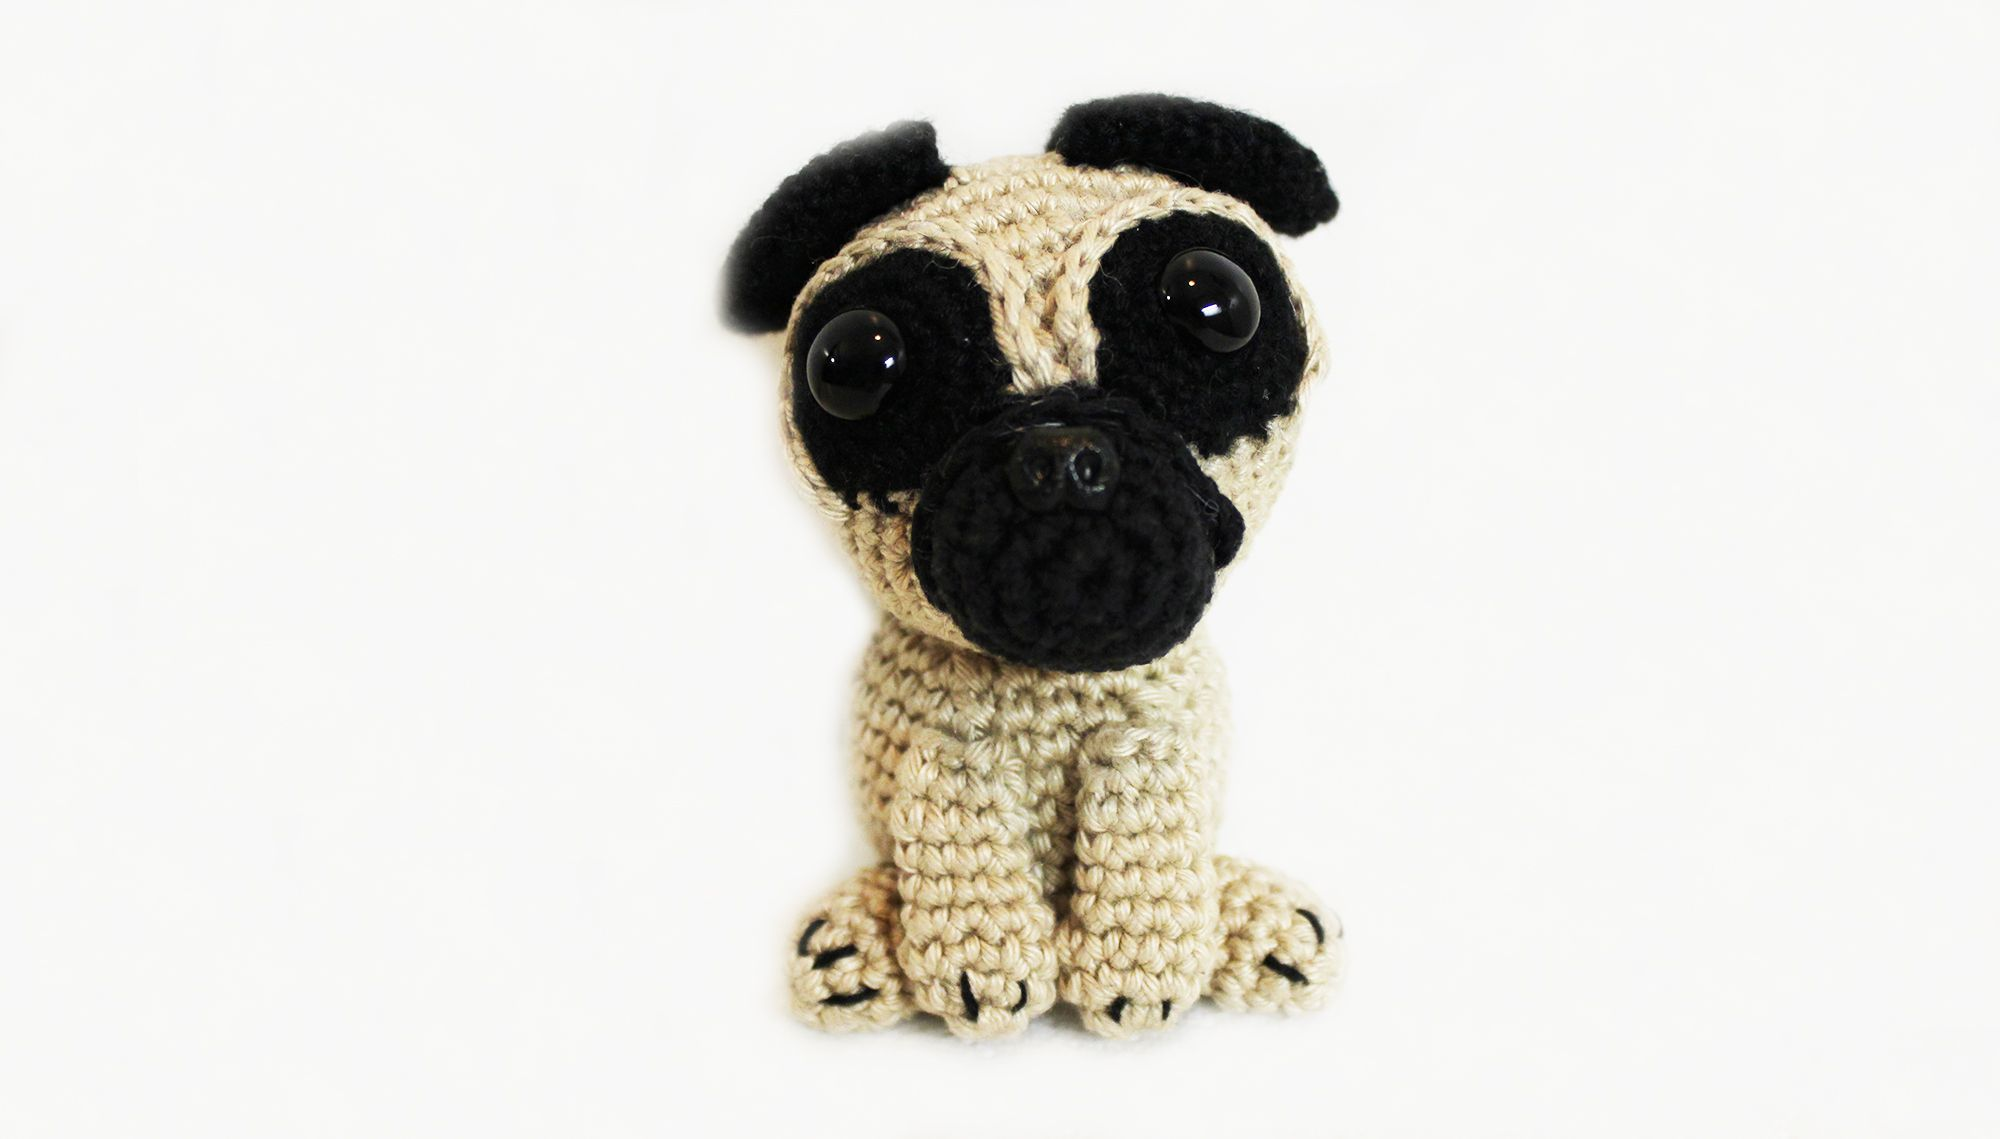 Sleepy chicken amigurumi pattern | Crochet dog patterns, Crochet ... | 1139x2000